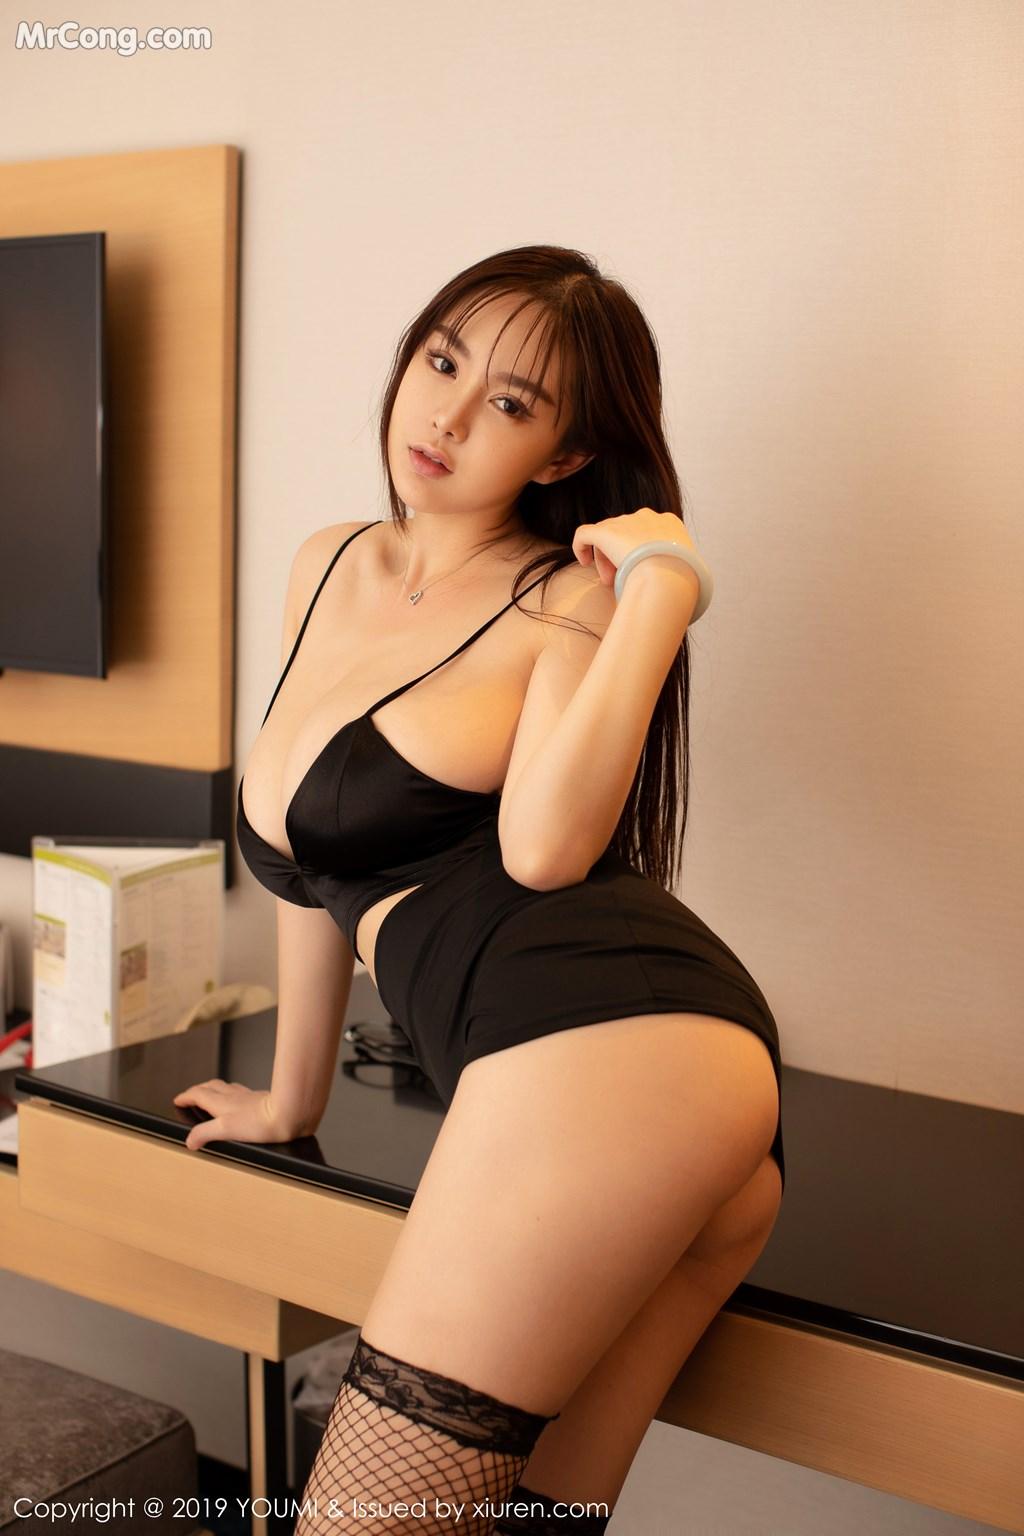 Image YouMi-Vol.311-Silvia-MrCong.com-028 in post YouMi Vol.311: 易阳Silvia (46 ảnh)